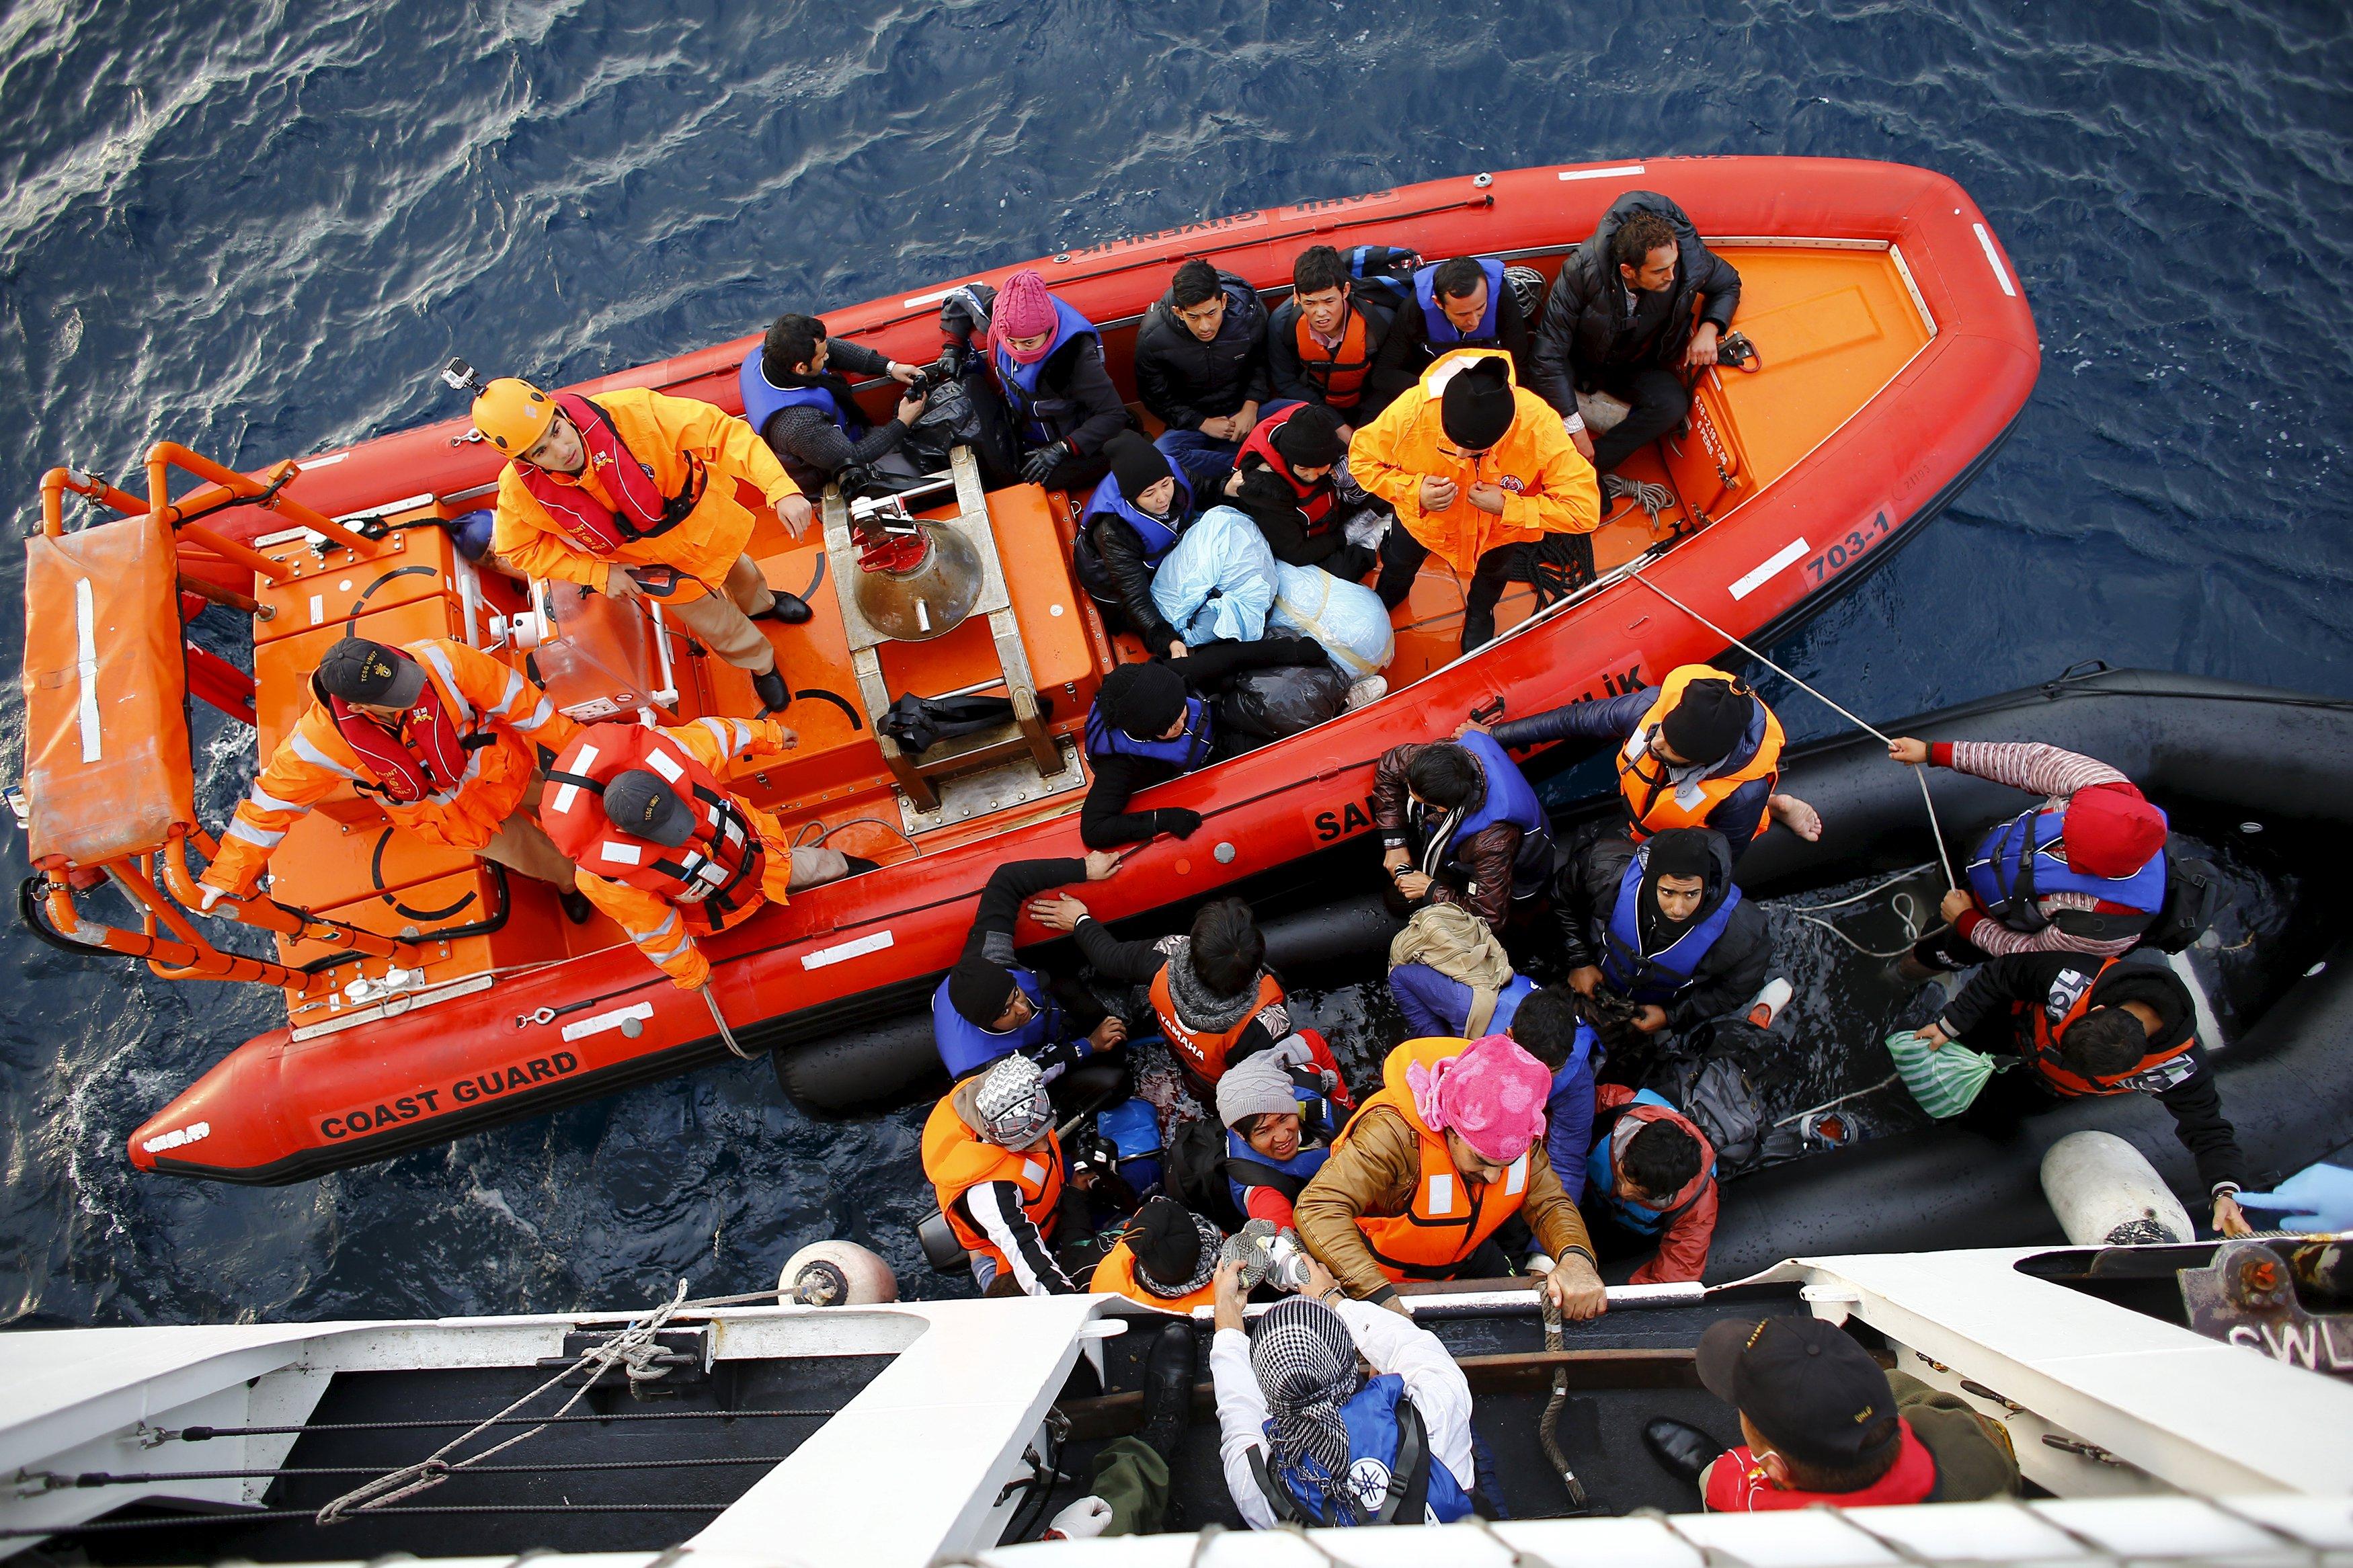 Pengungsi dan migran menumpang kapal Umut-703 milik Tim Penyelamat Penjaga Pantai Turki, lepas pantai Canakkale, Turki, setelah gagal menyeberang ke pulau Lesbos Yunani, Minggu (8/11). REUTERS/Umit Bektas.